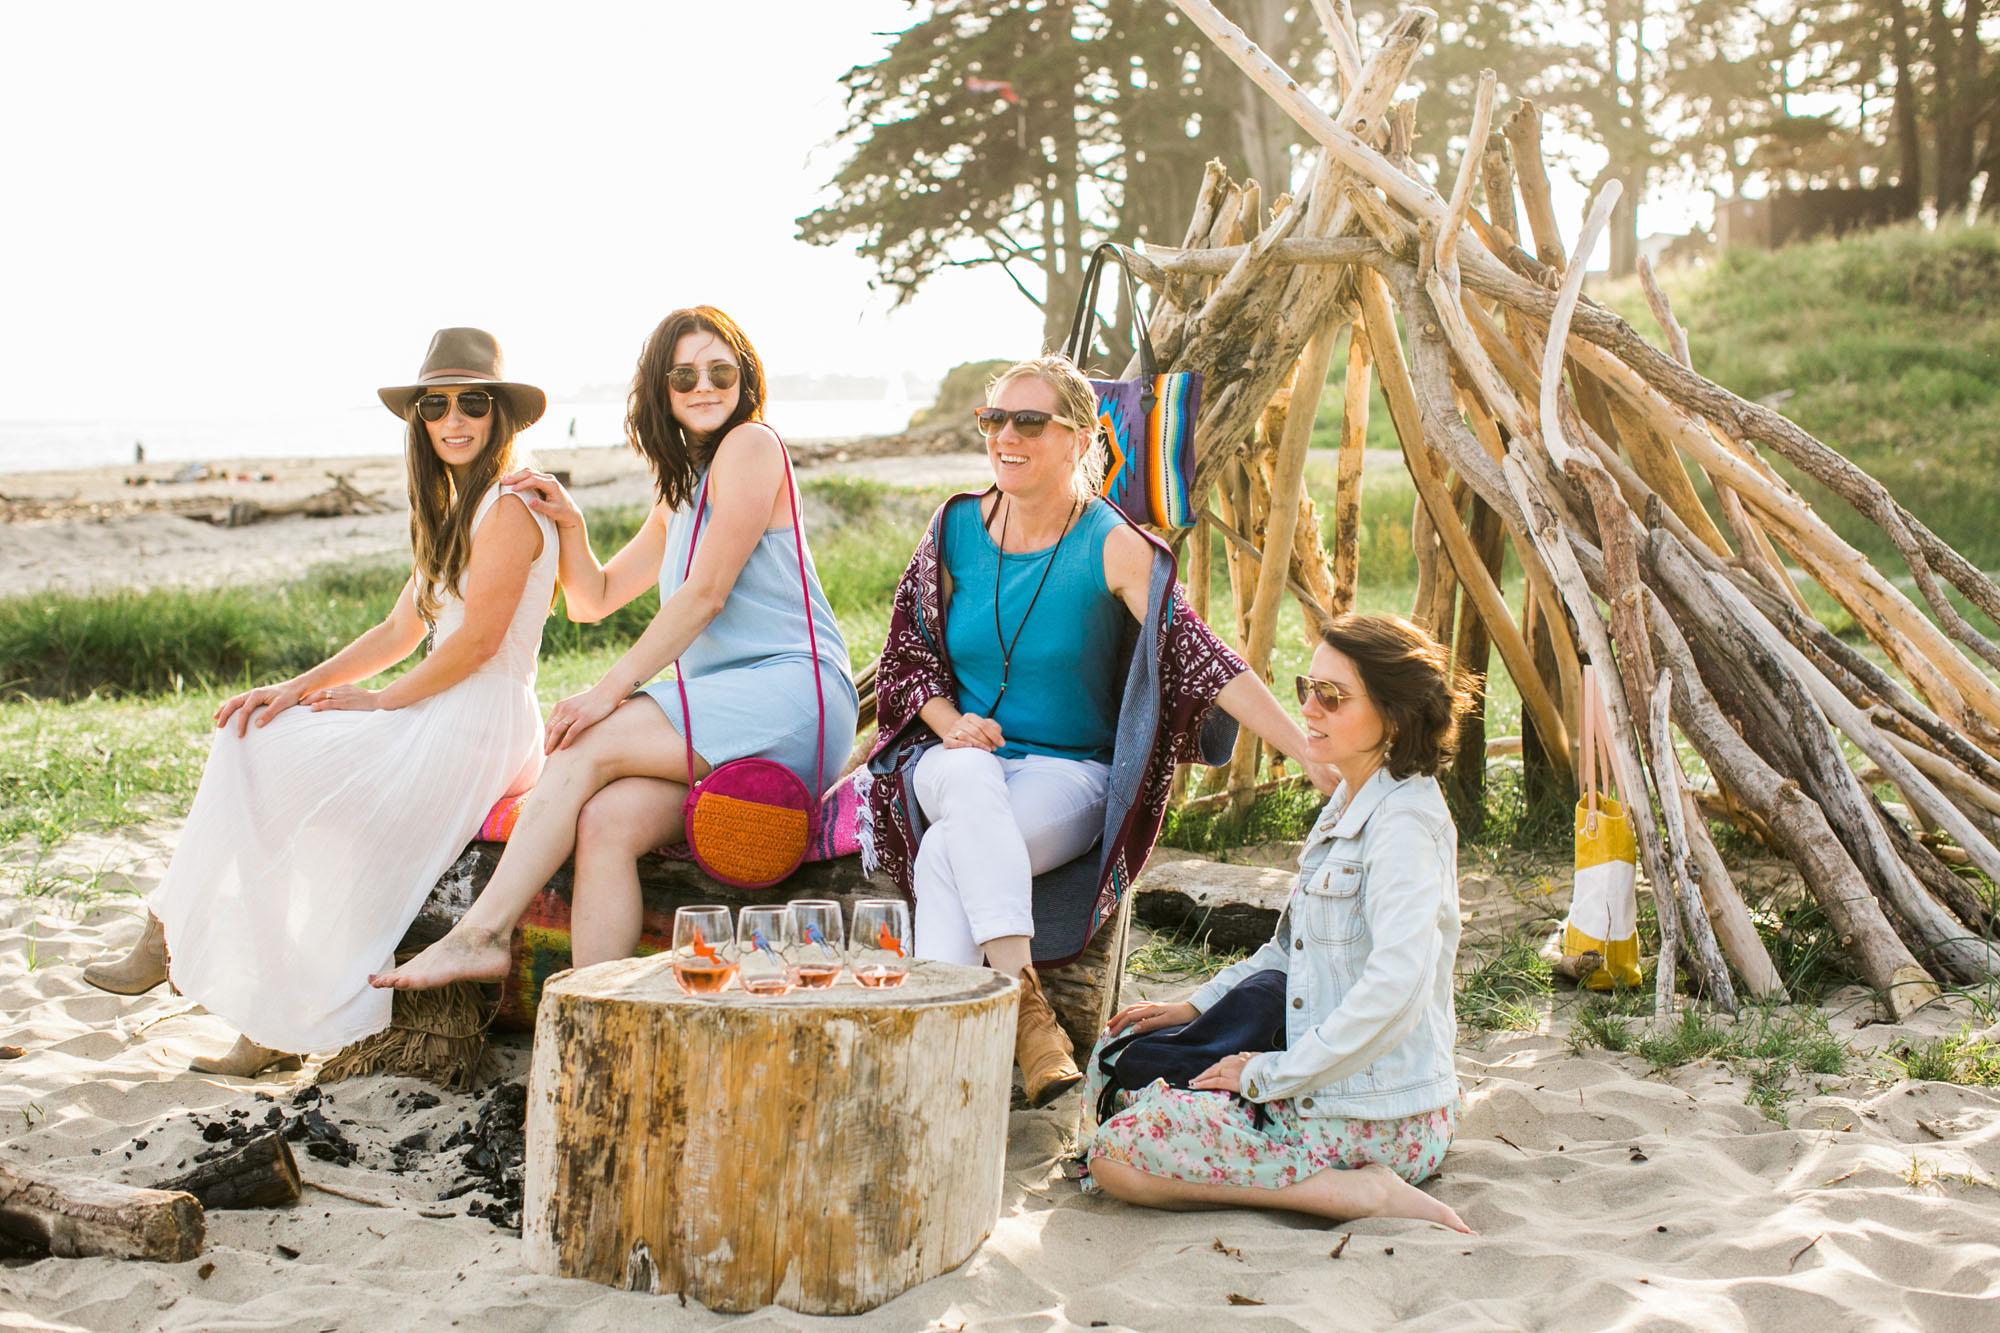 women-gathering-beach-picnic-ClosetShopper.jpg